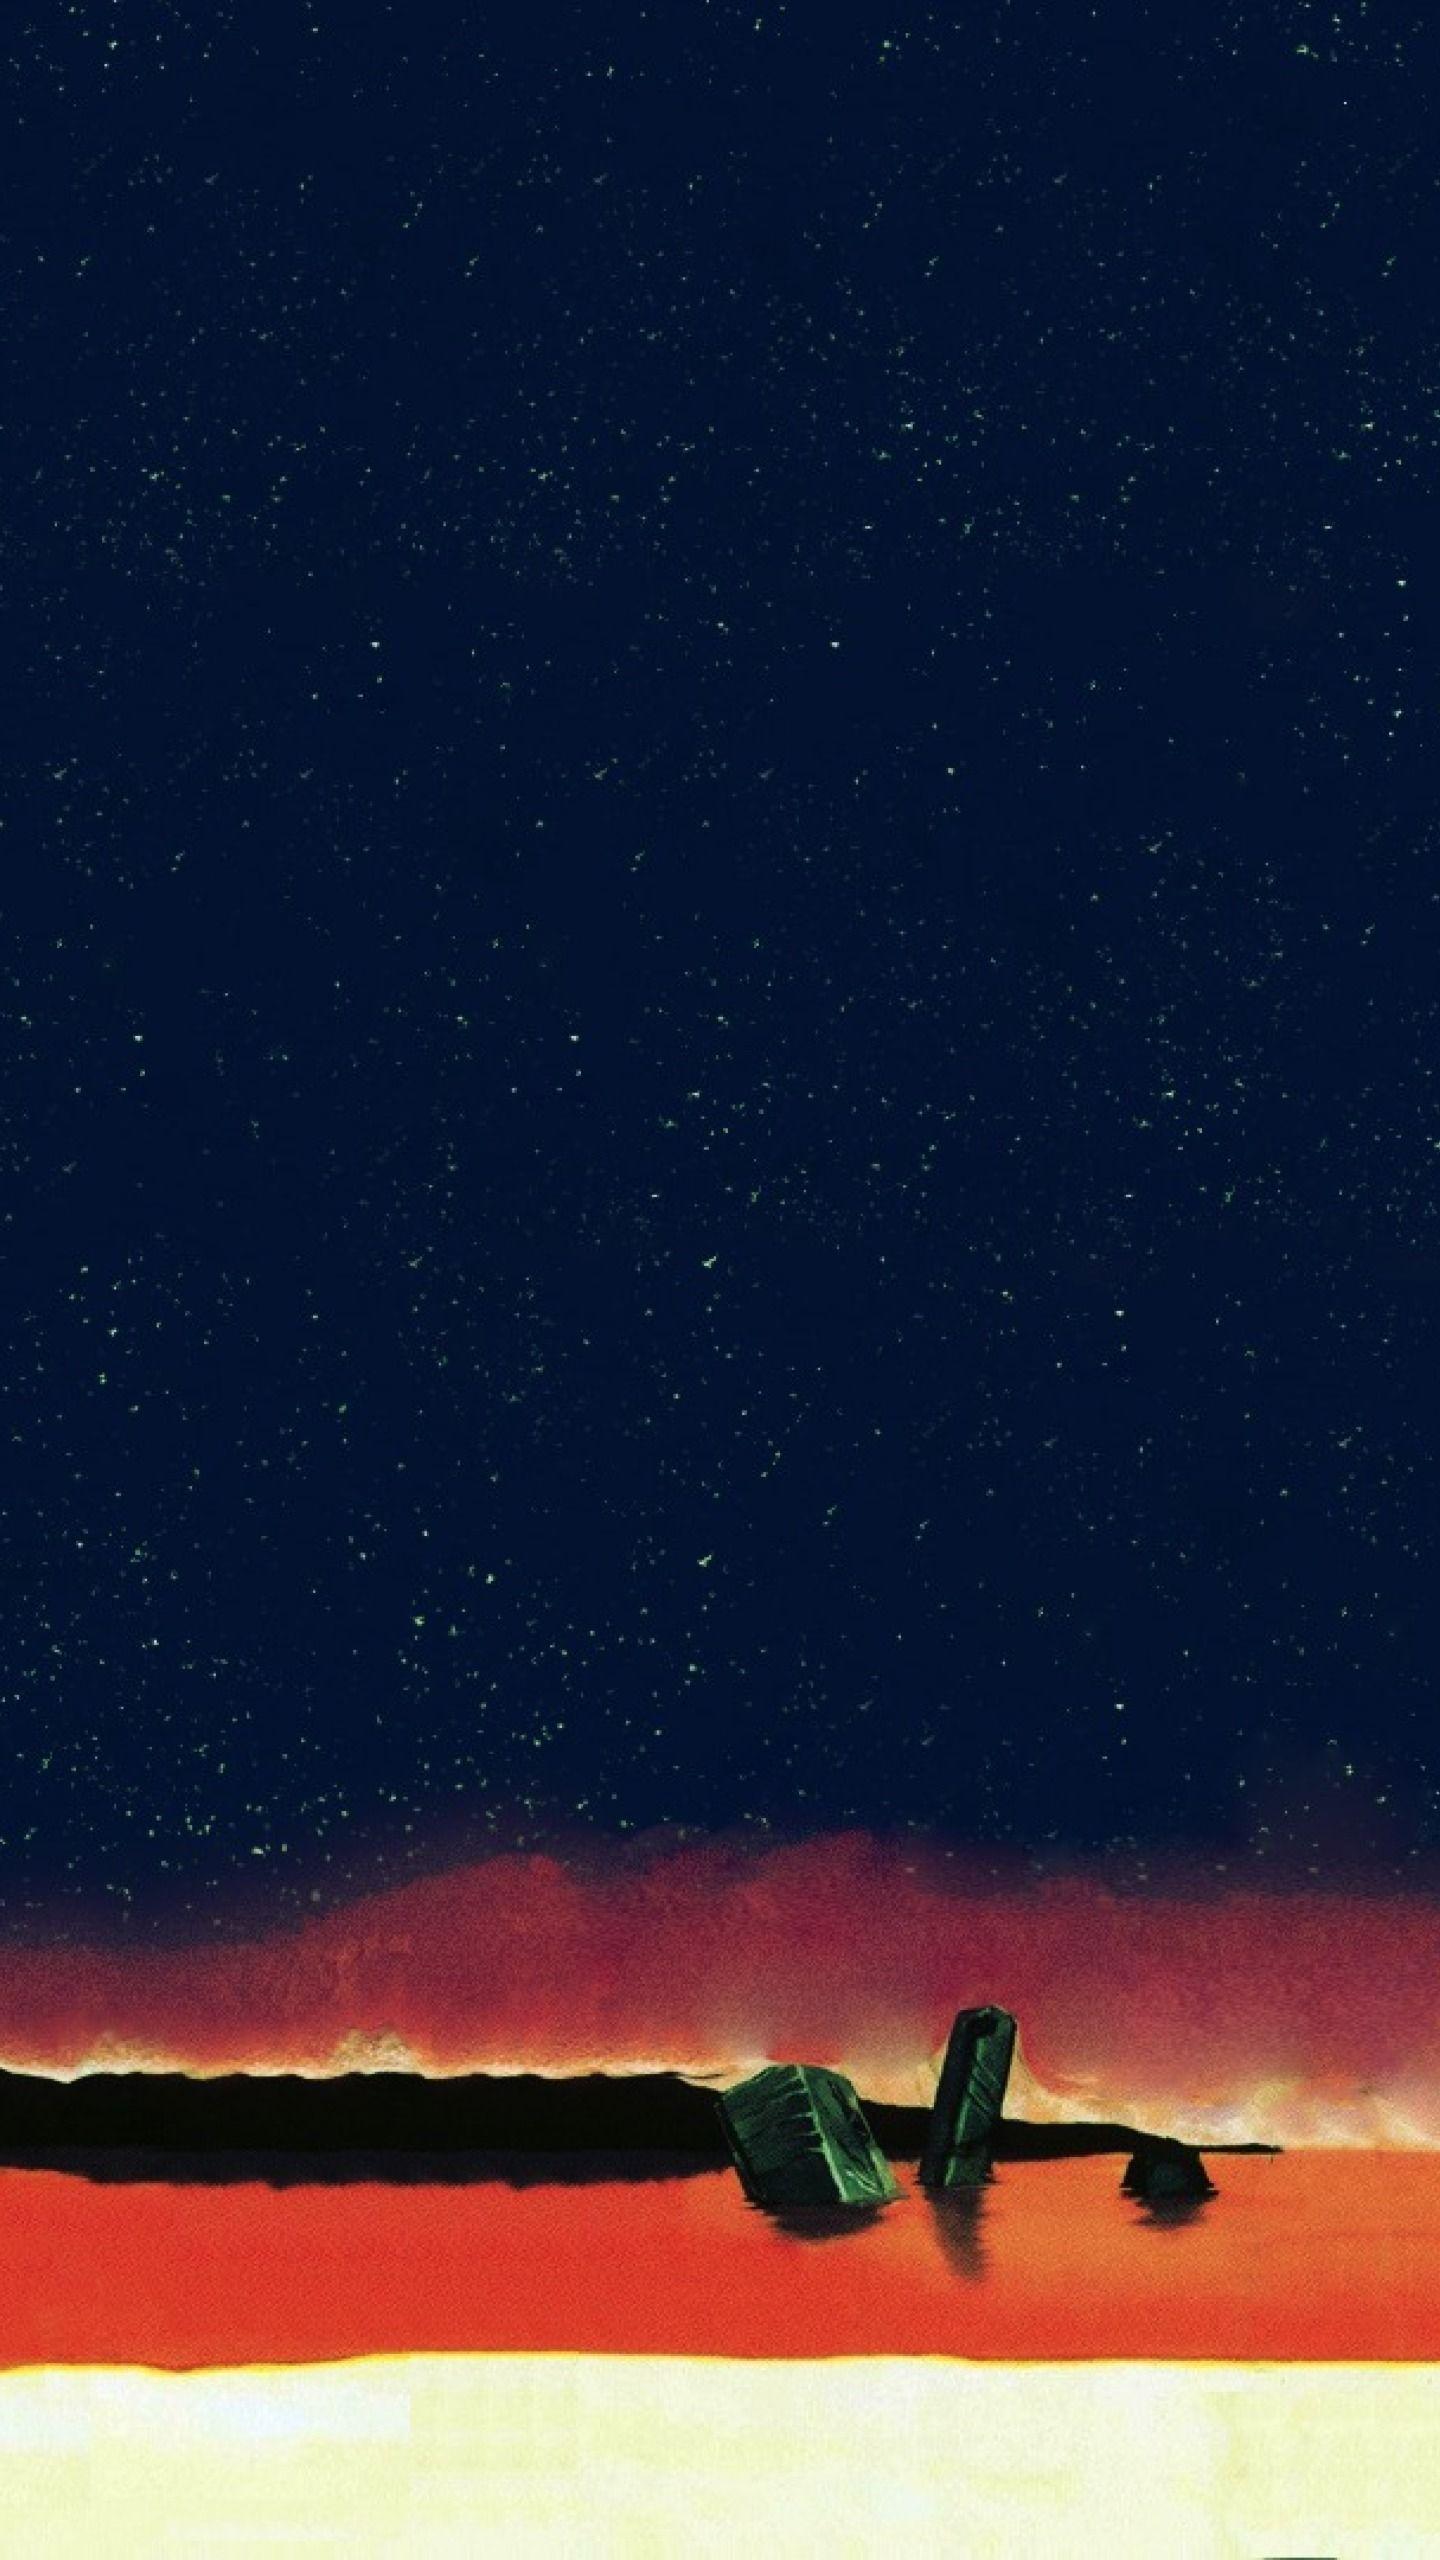 11 Original Evangelion Iphone Wallpaper To Copy Now Evangelion Neon Evangelion Iphone Wallpaper